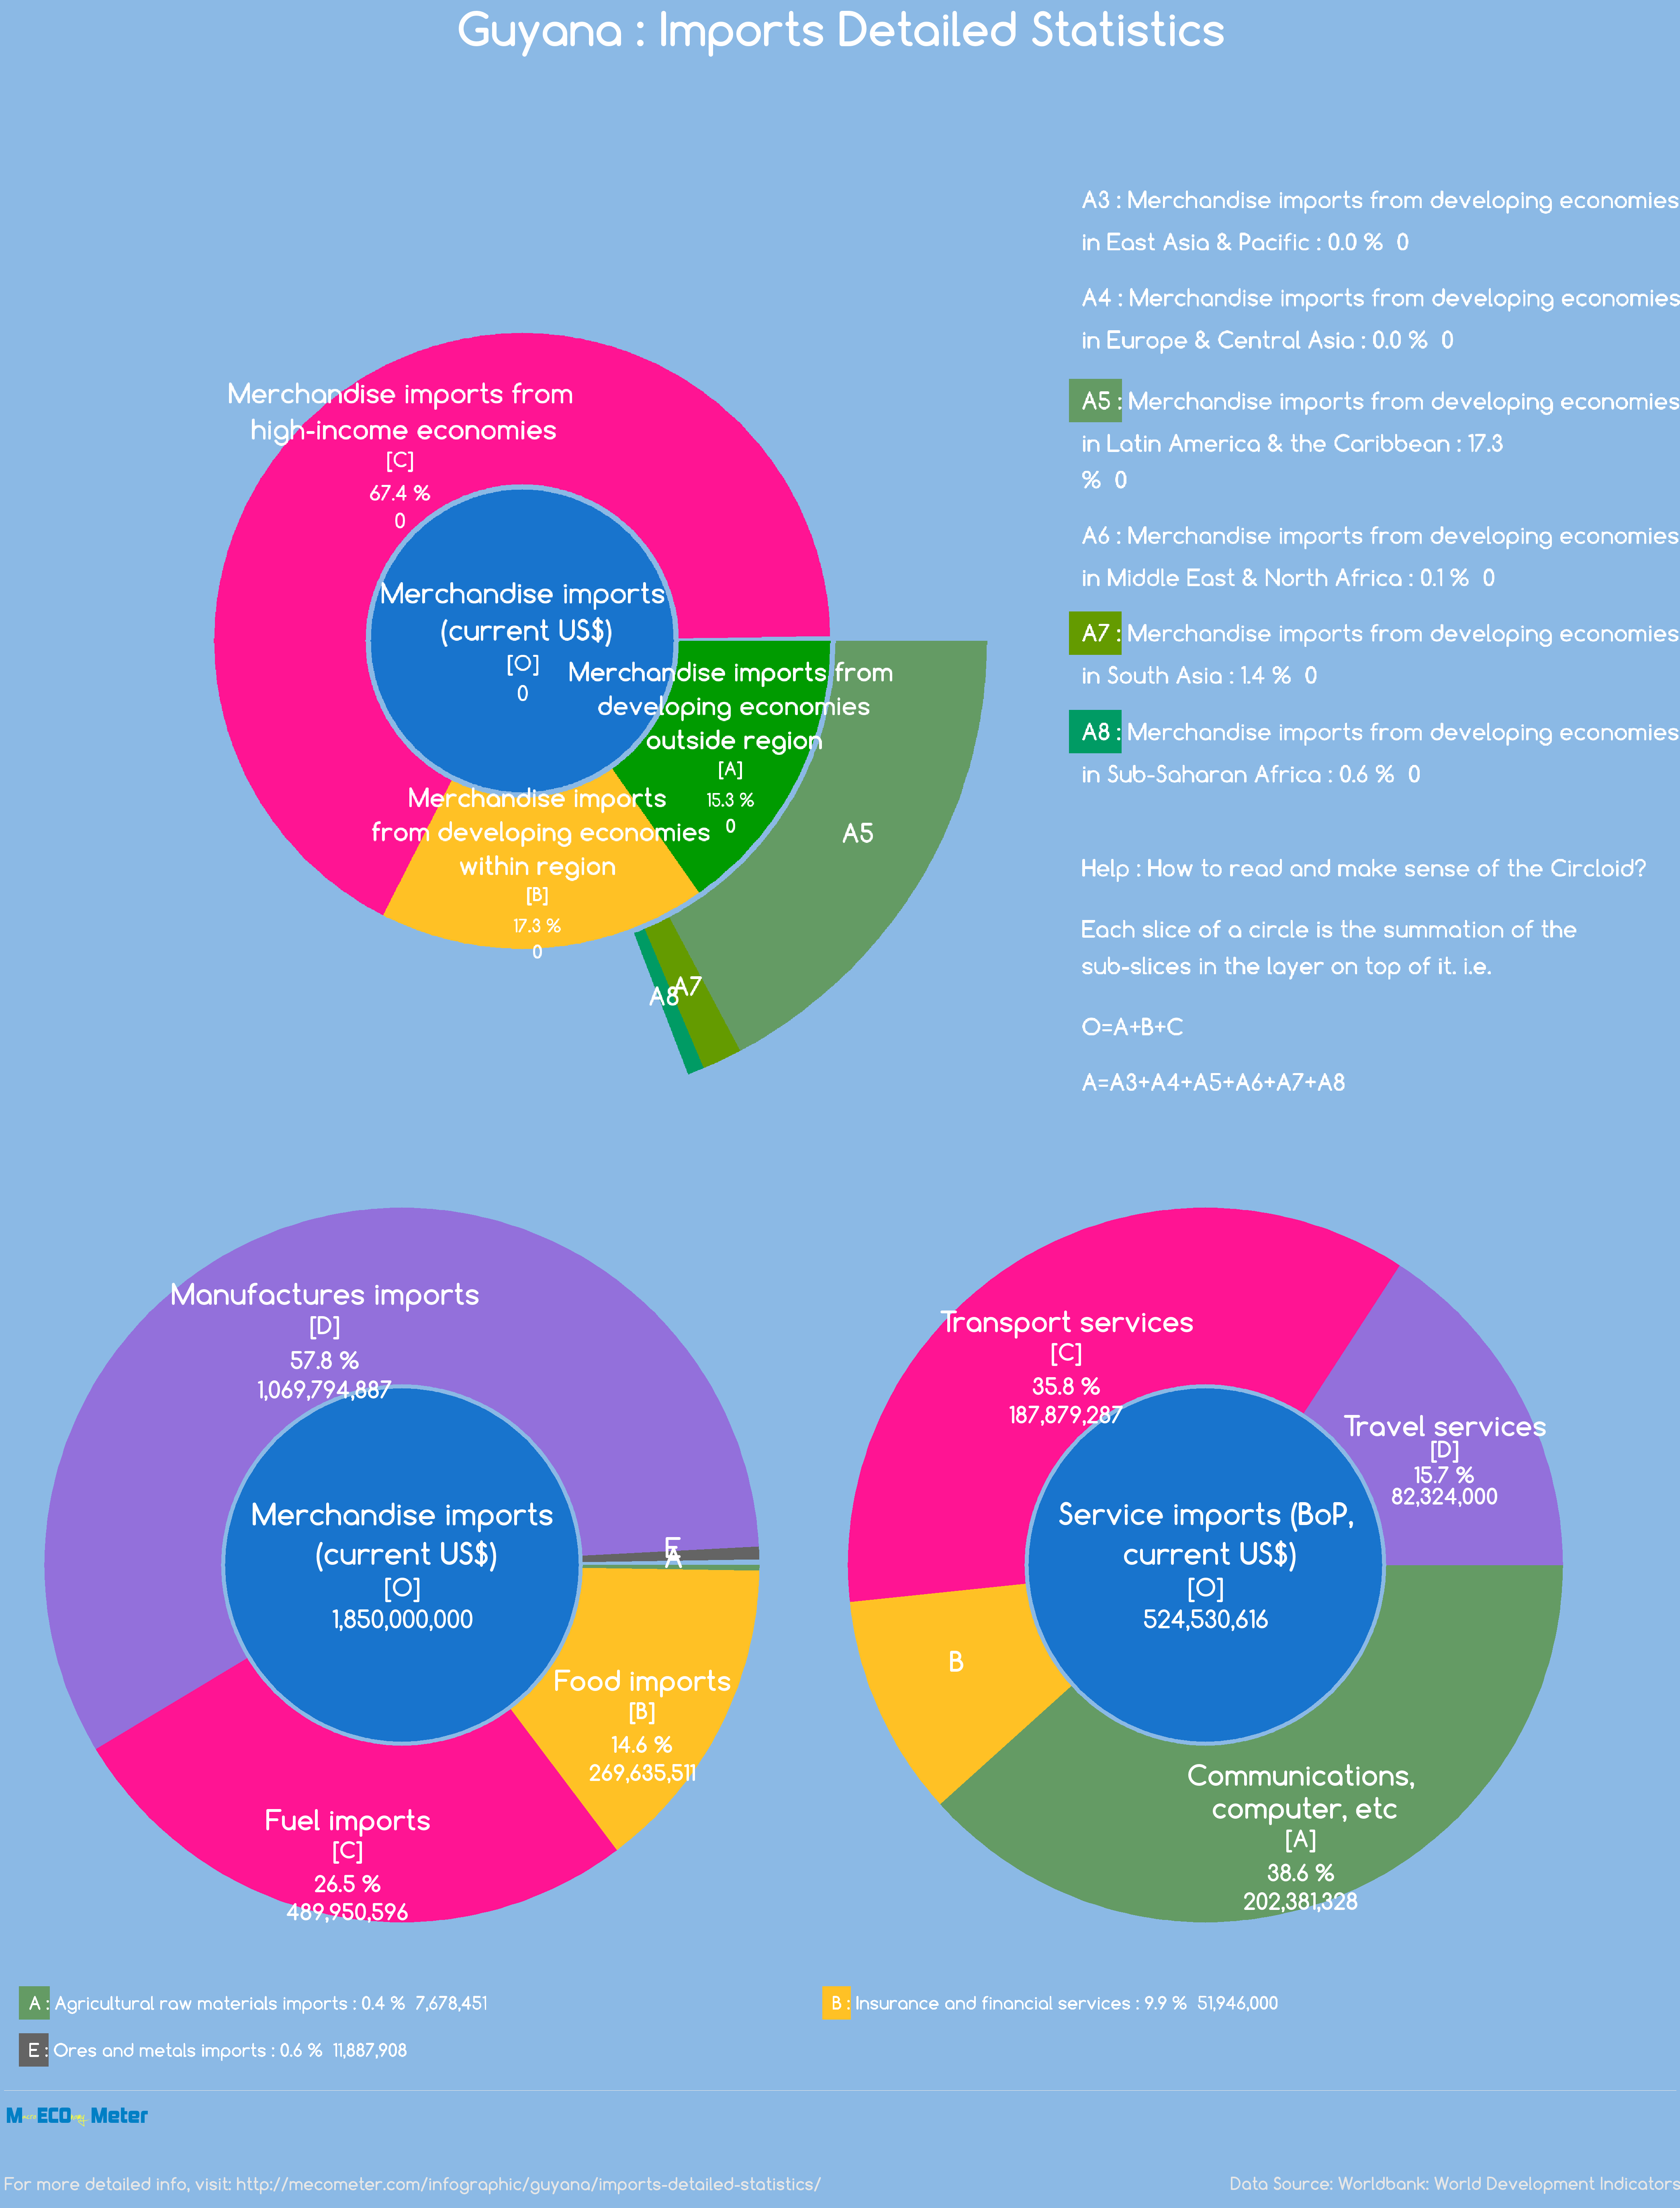 Guyana : Imports Detailed Statistics